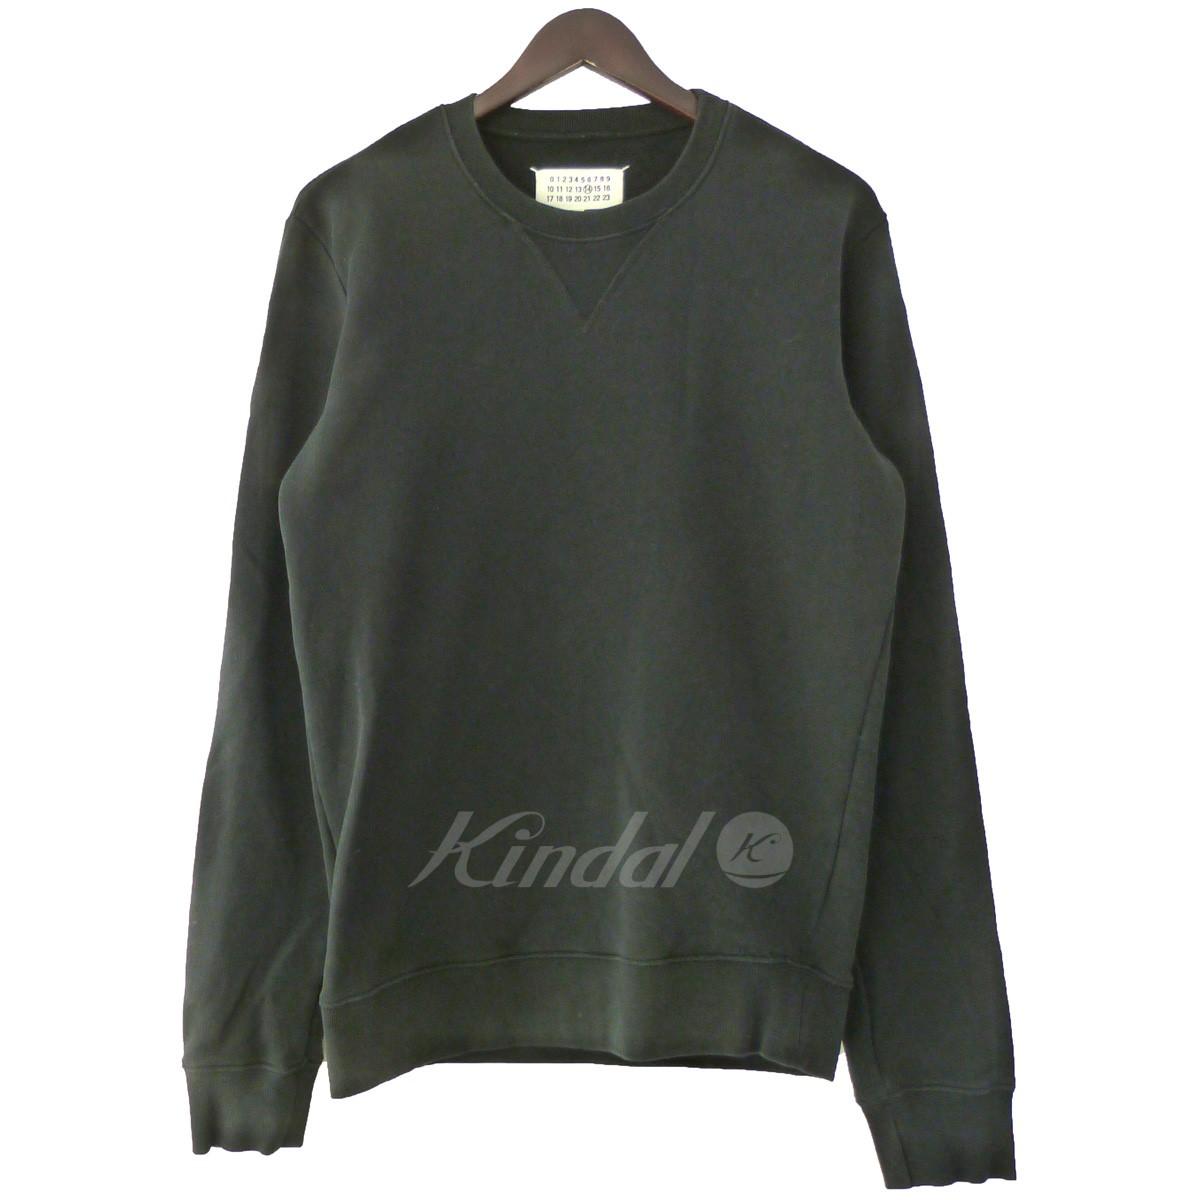 50 Coat Hanger Size Cube Menswear Jacket Size 46 LONG BLACK Mens Garment Clothes